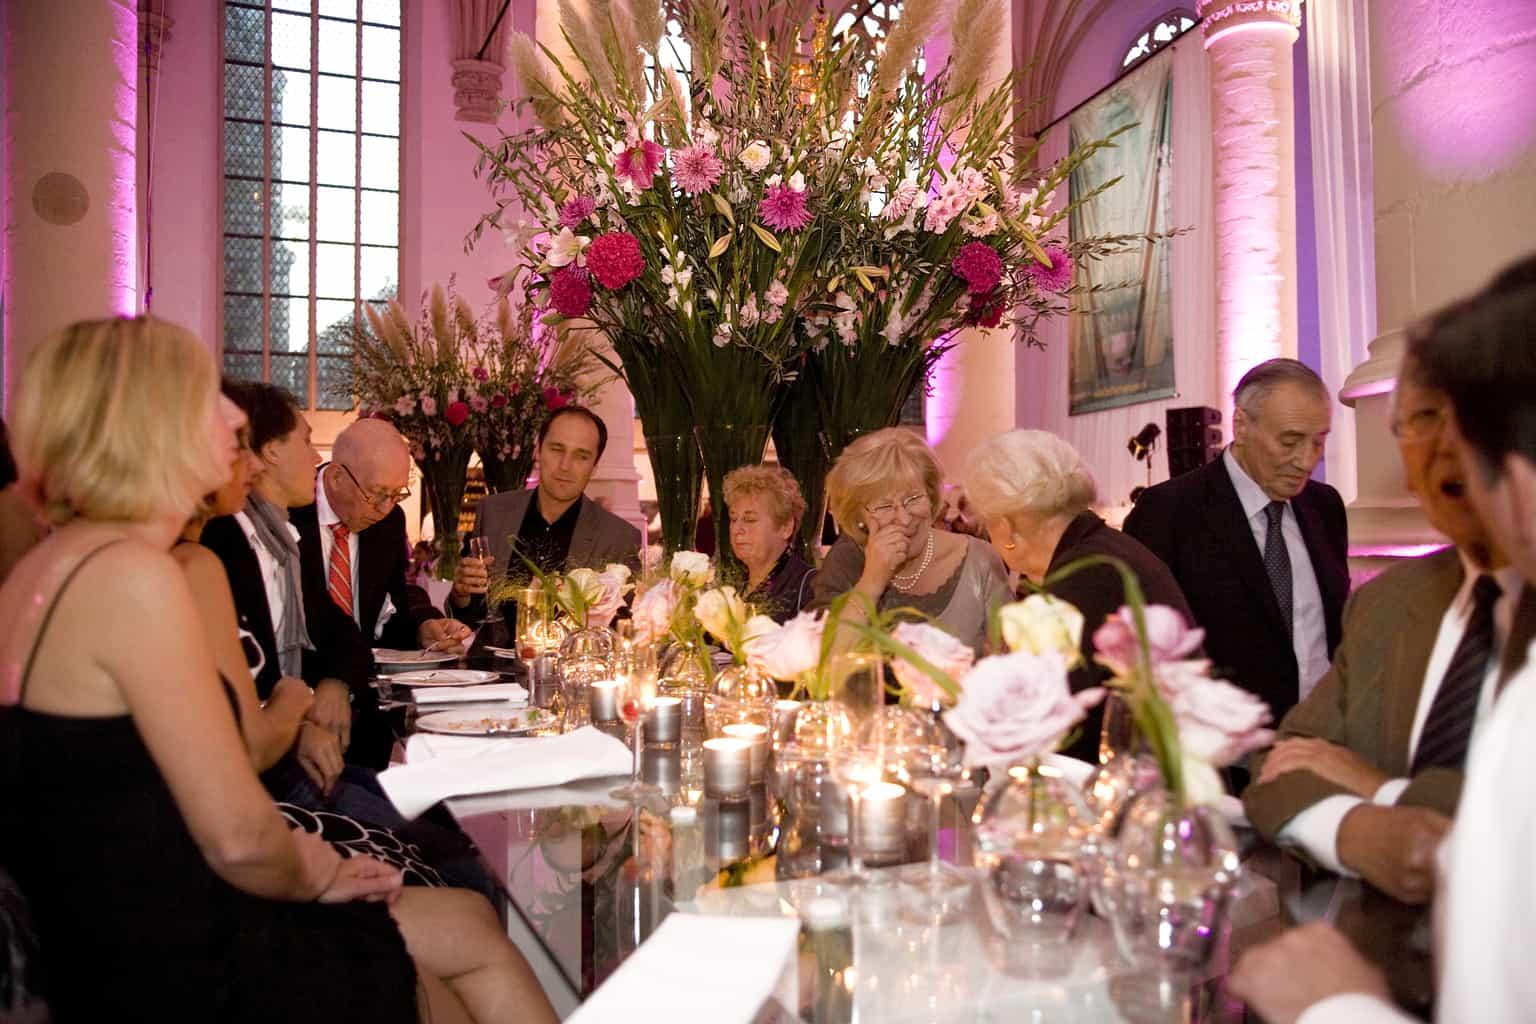 Wedding en Planning, Weddingplanner, fotocredits Sjouke Dijkstra